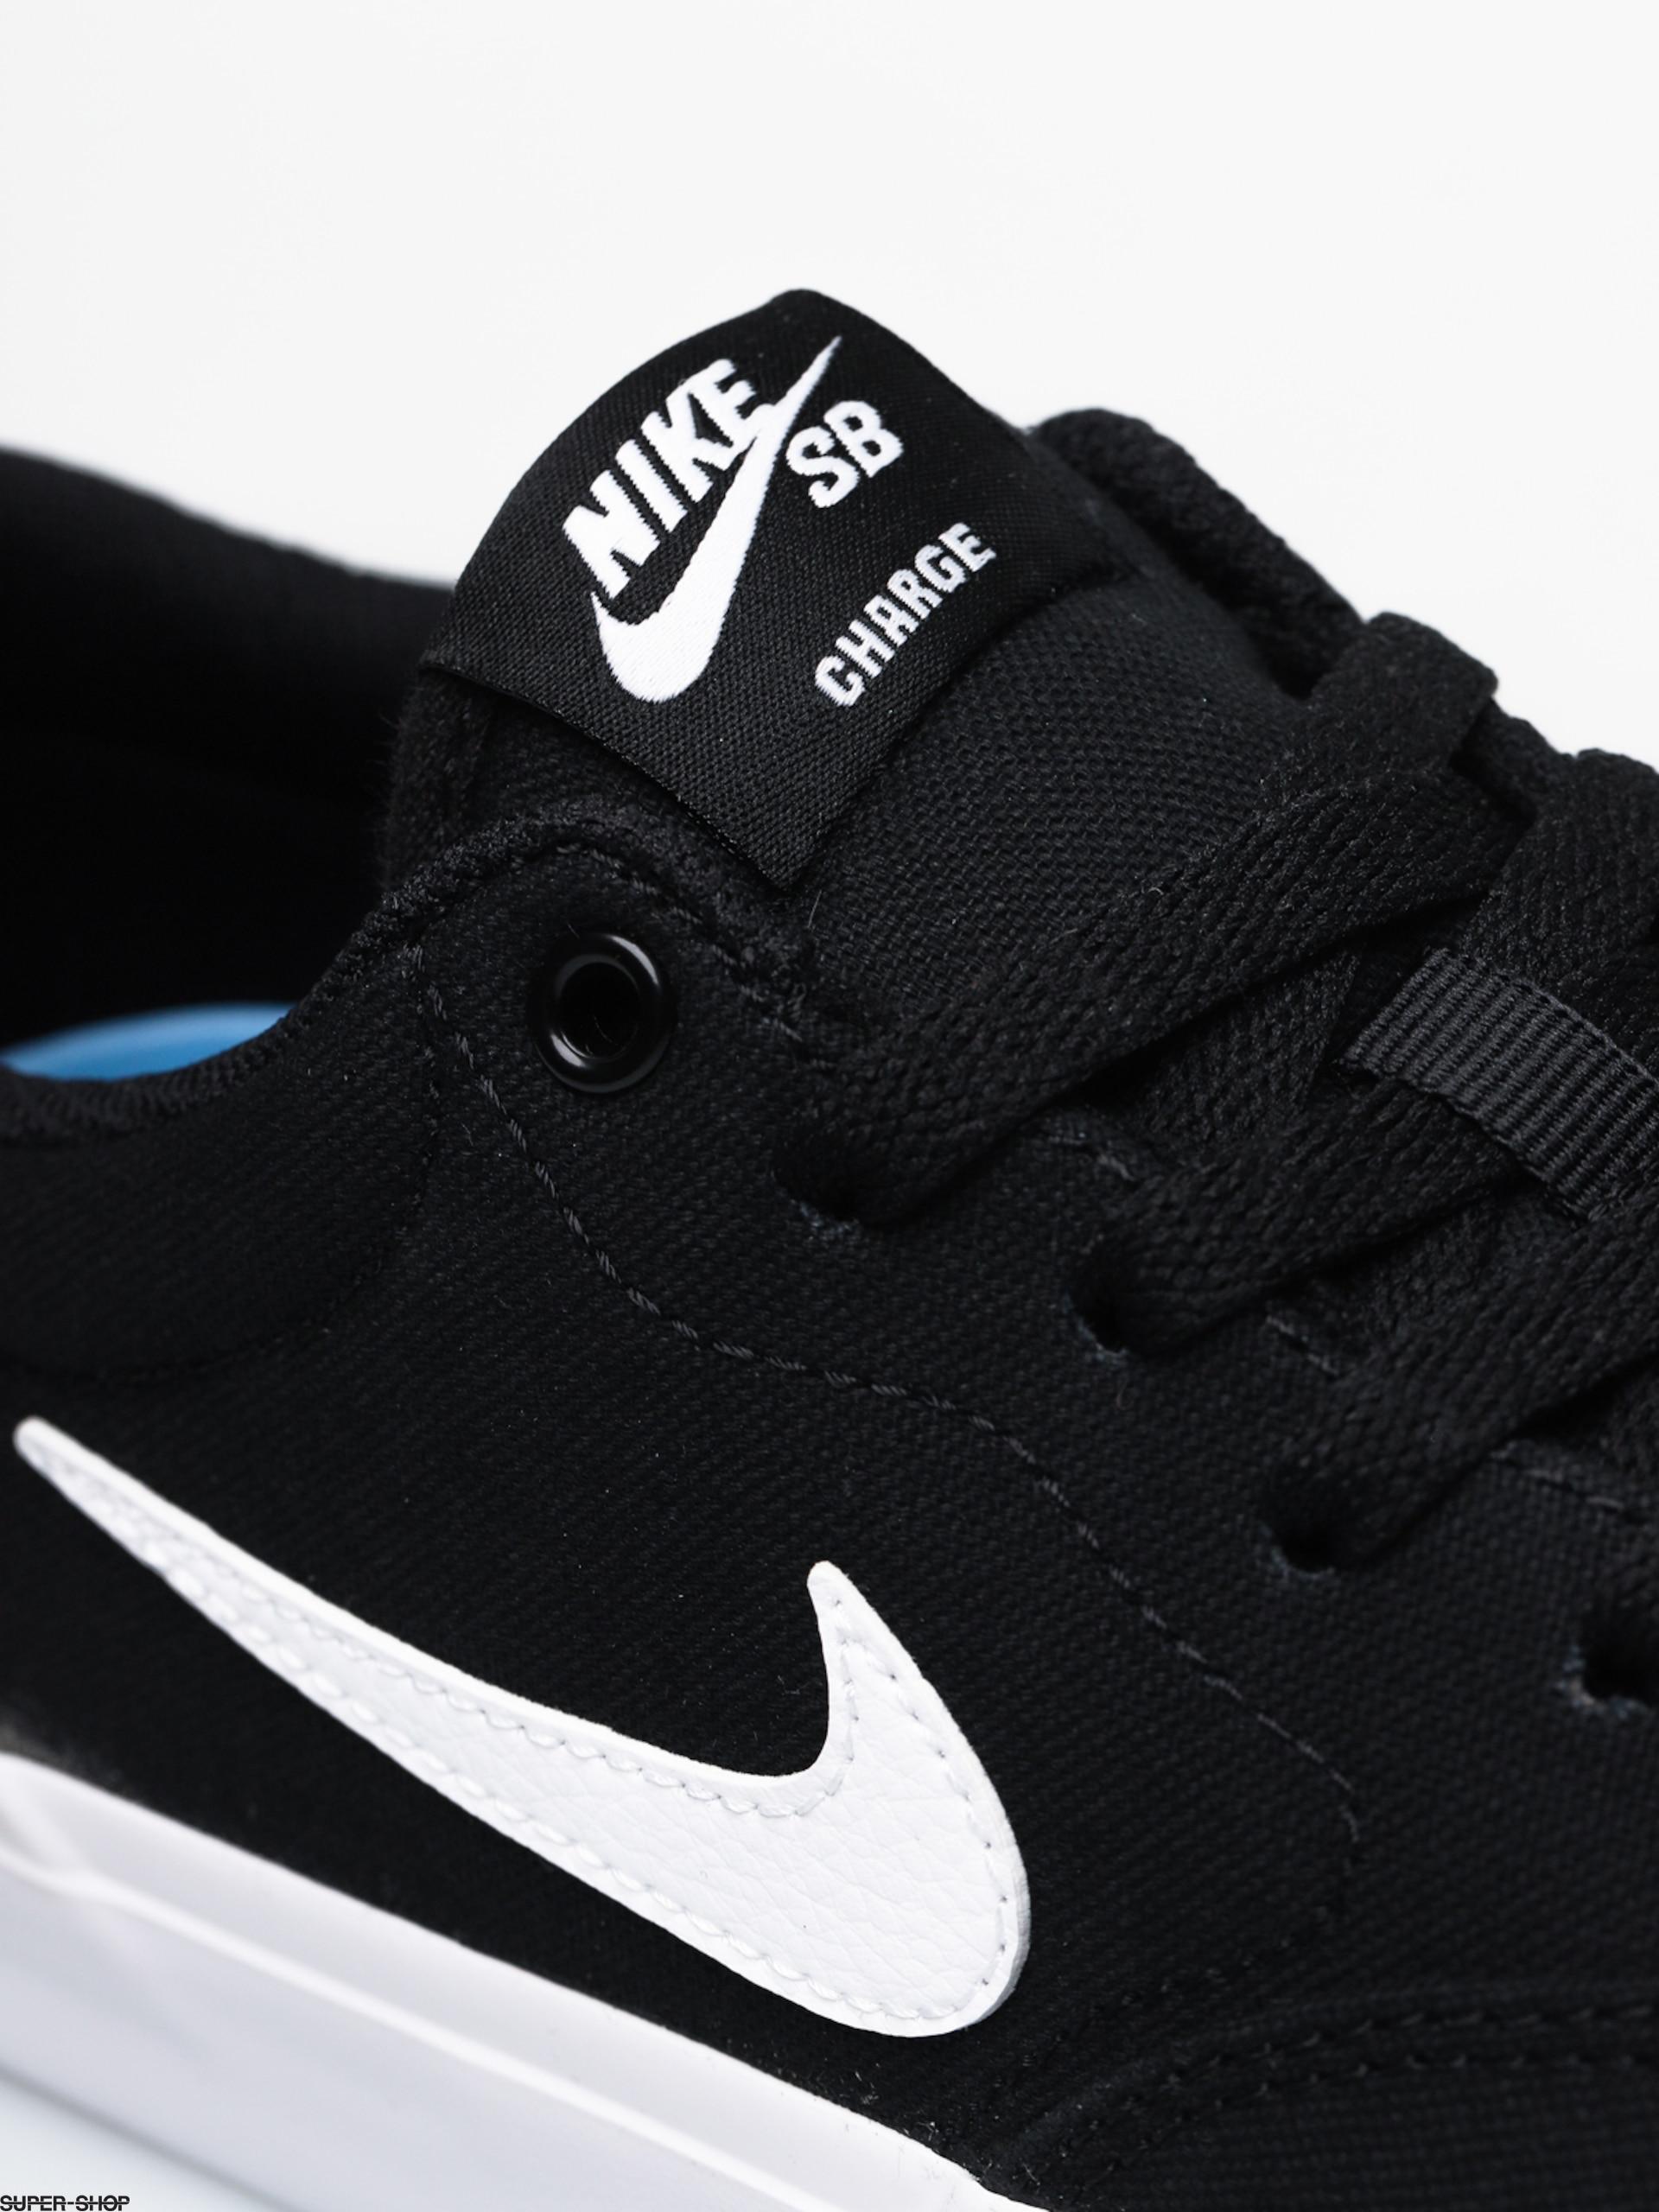 Nike SB Charge Slr Shoes (black/white)